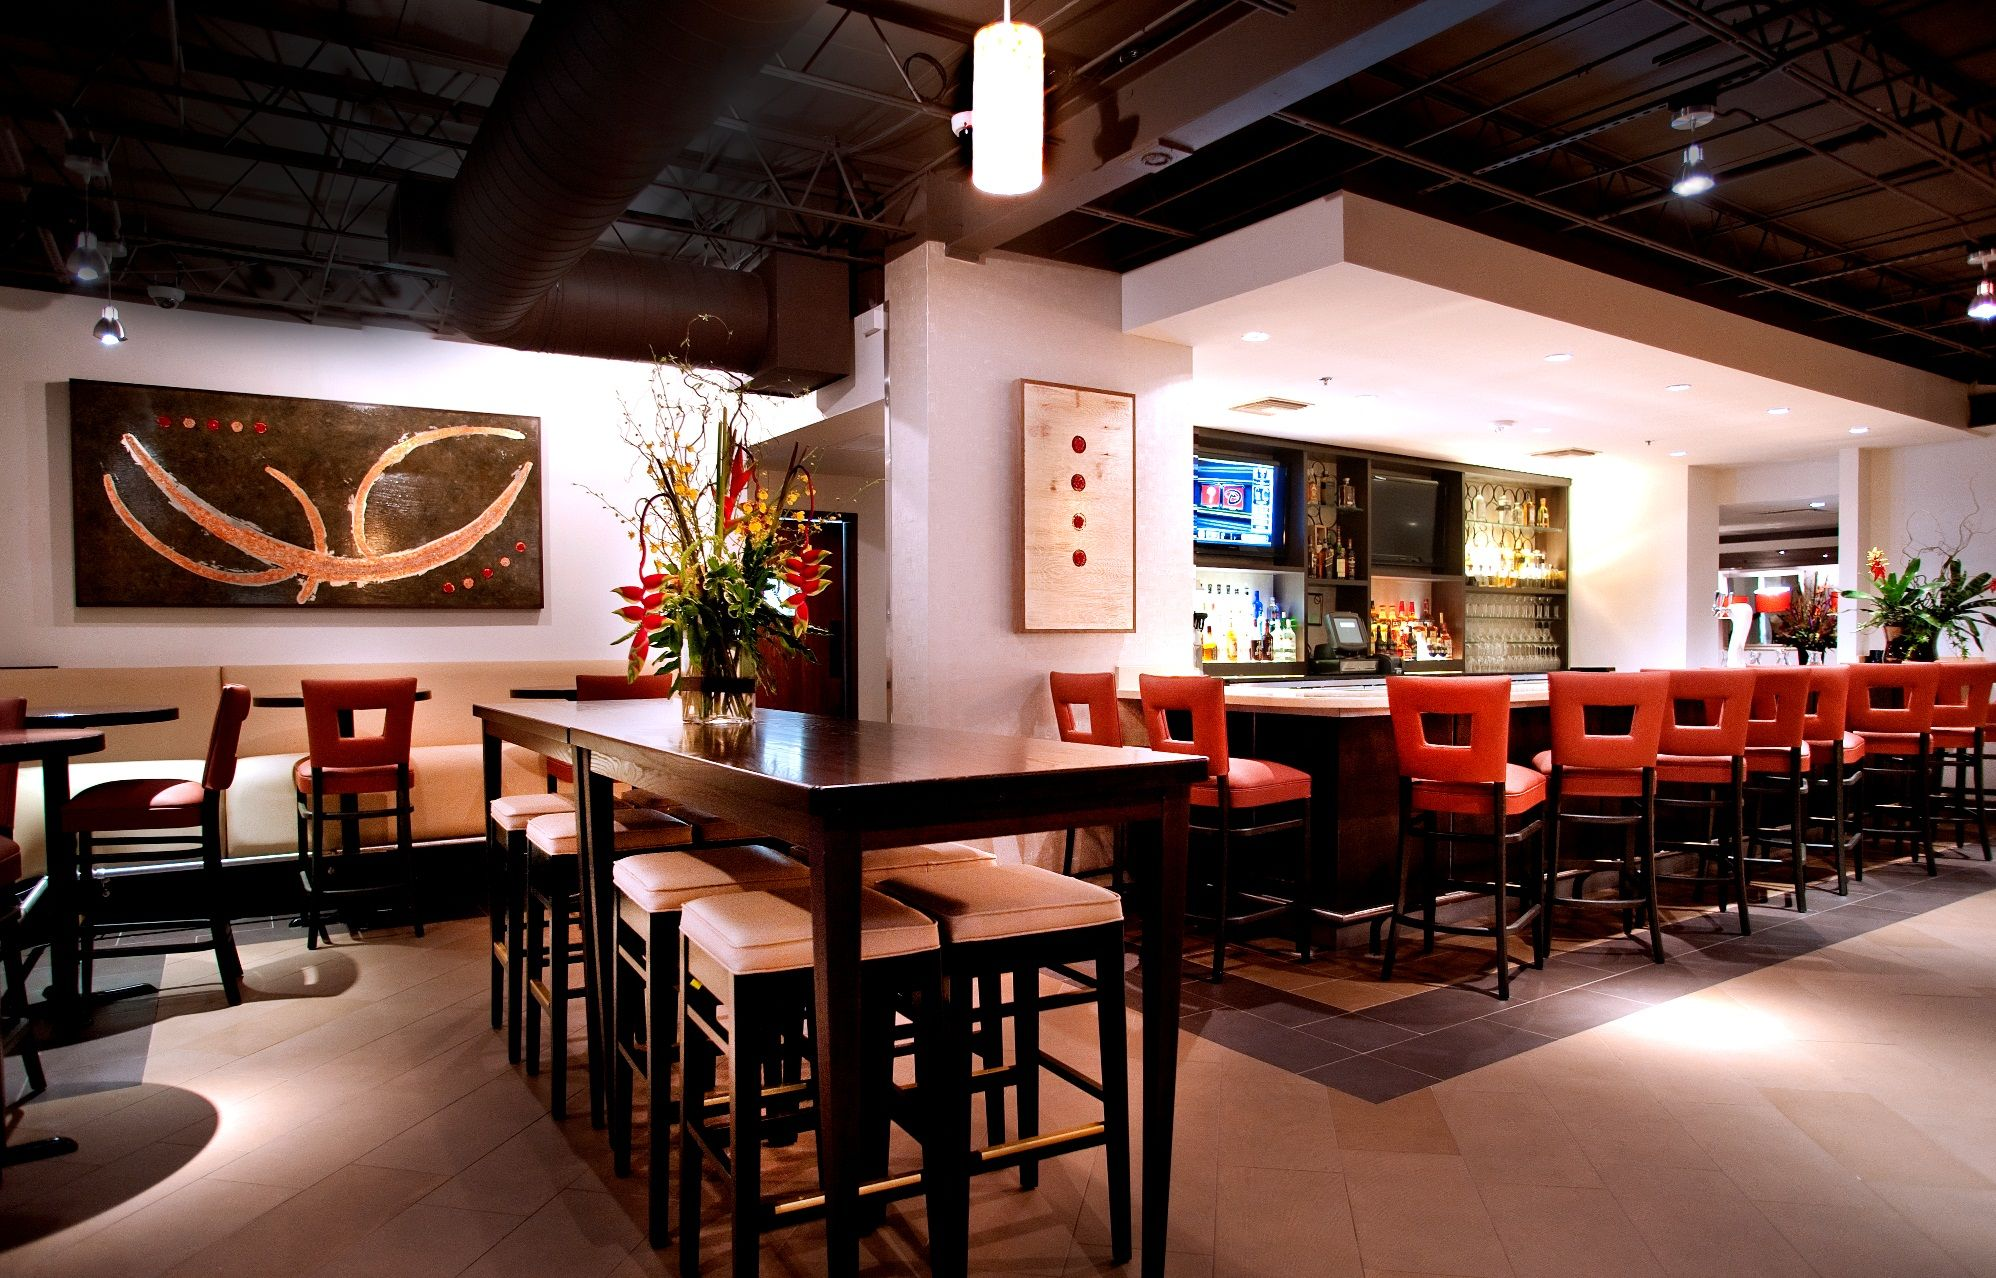 about in 2012 | restaurant interior design | schmidt design studio